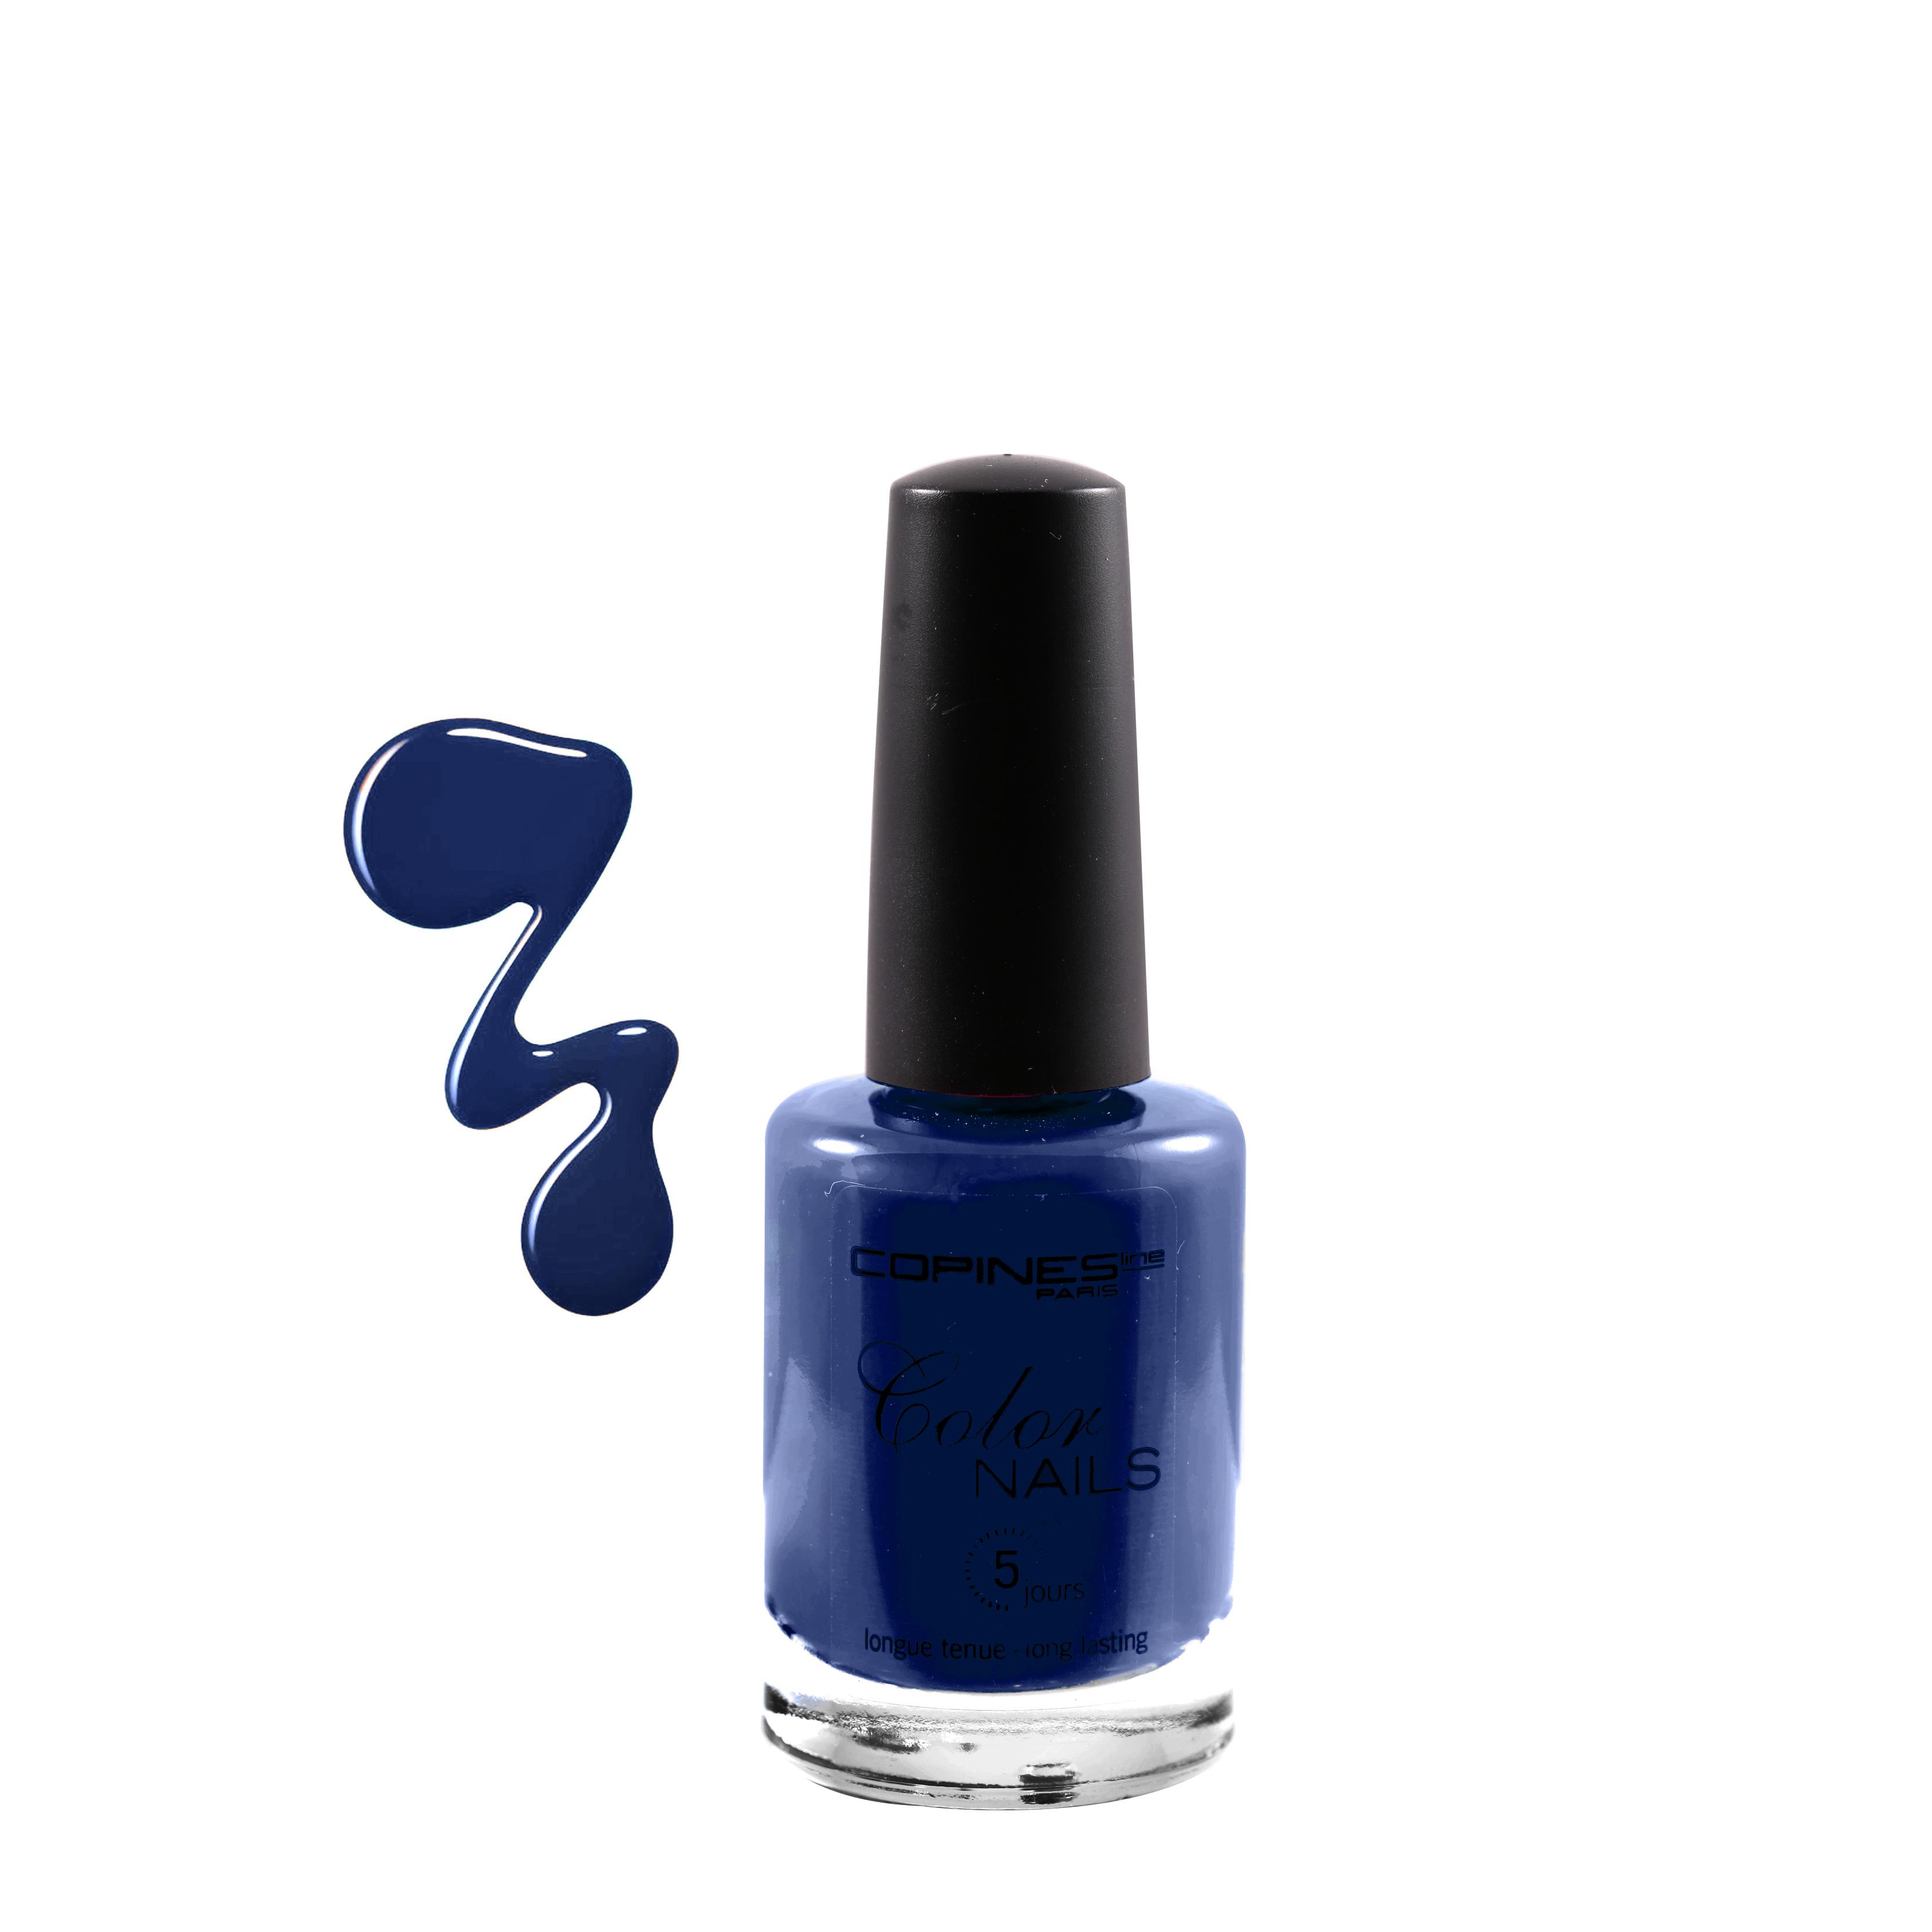 لاک ناخن کُپین شماره 23 - آبی صدفی